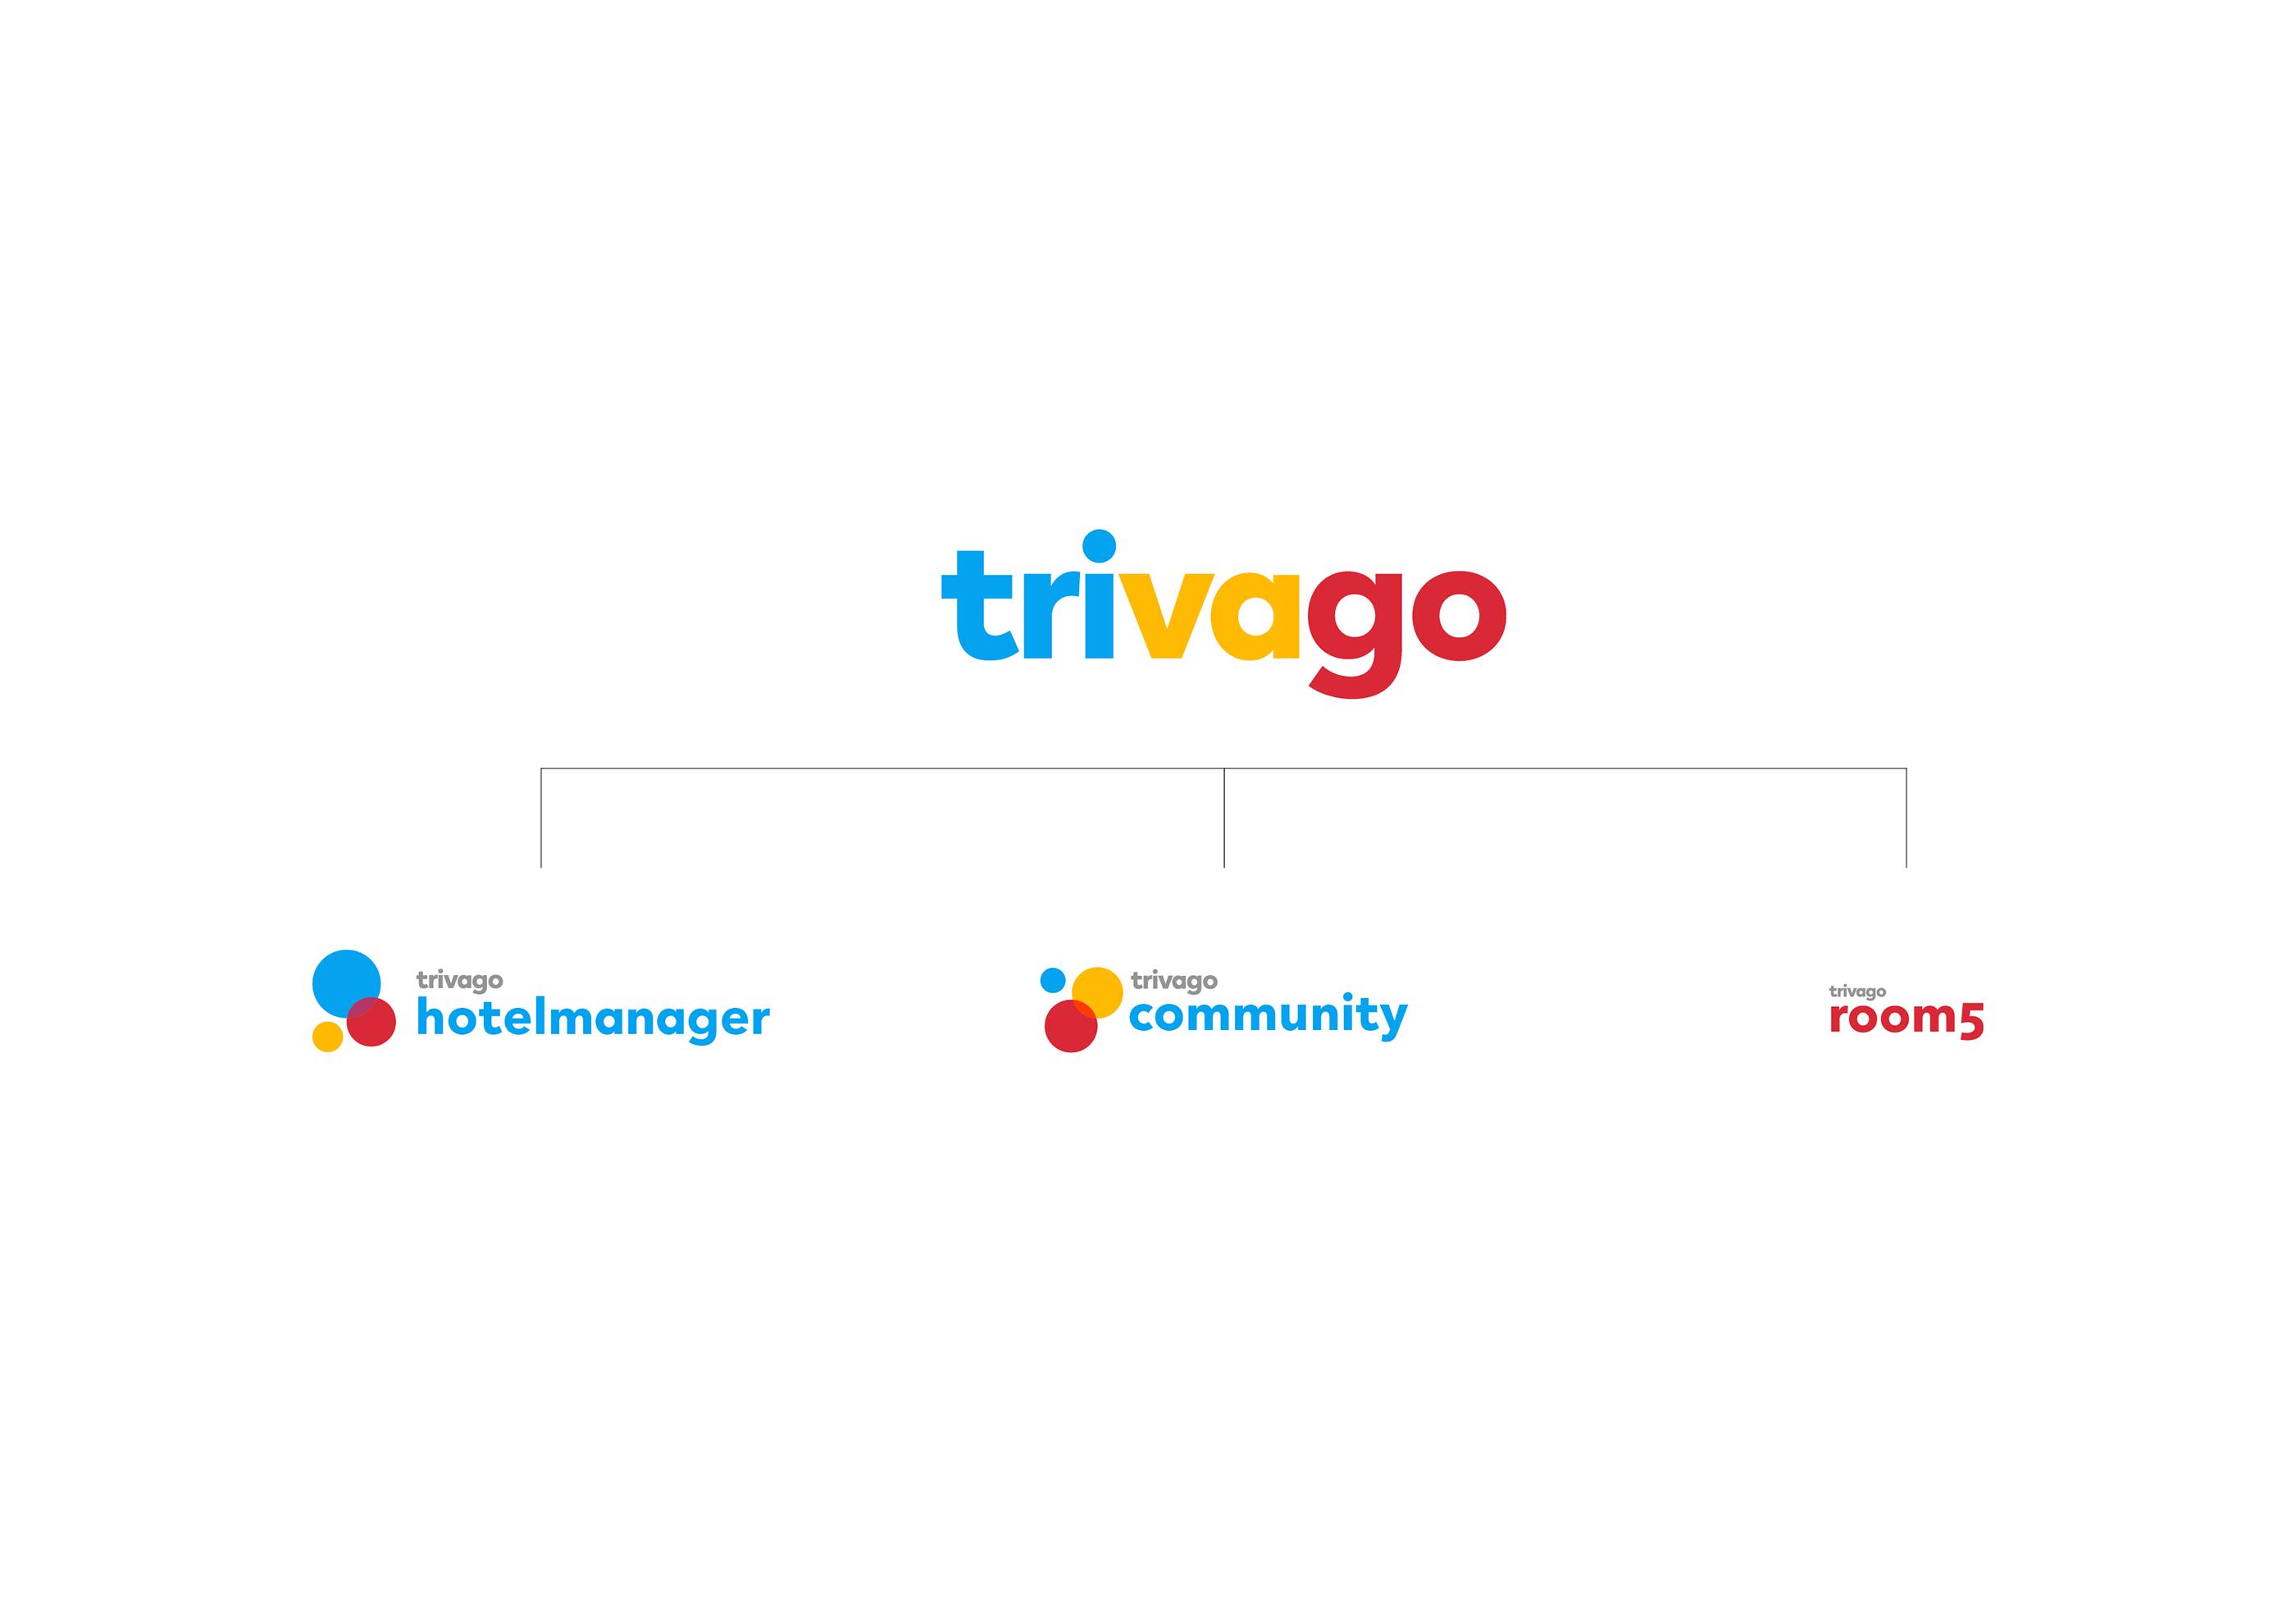 Trivago Brand Design Case Study On Behance